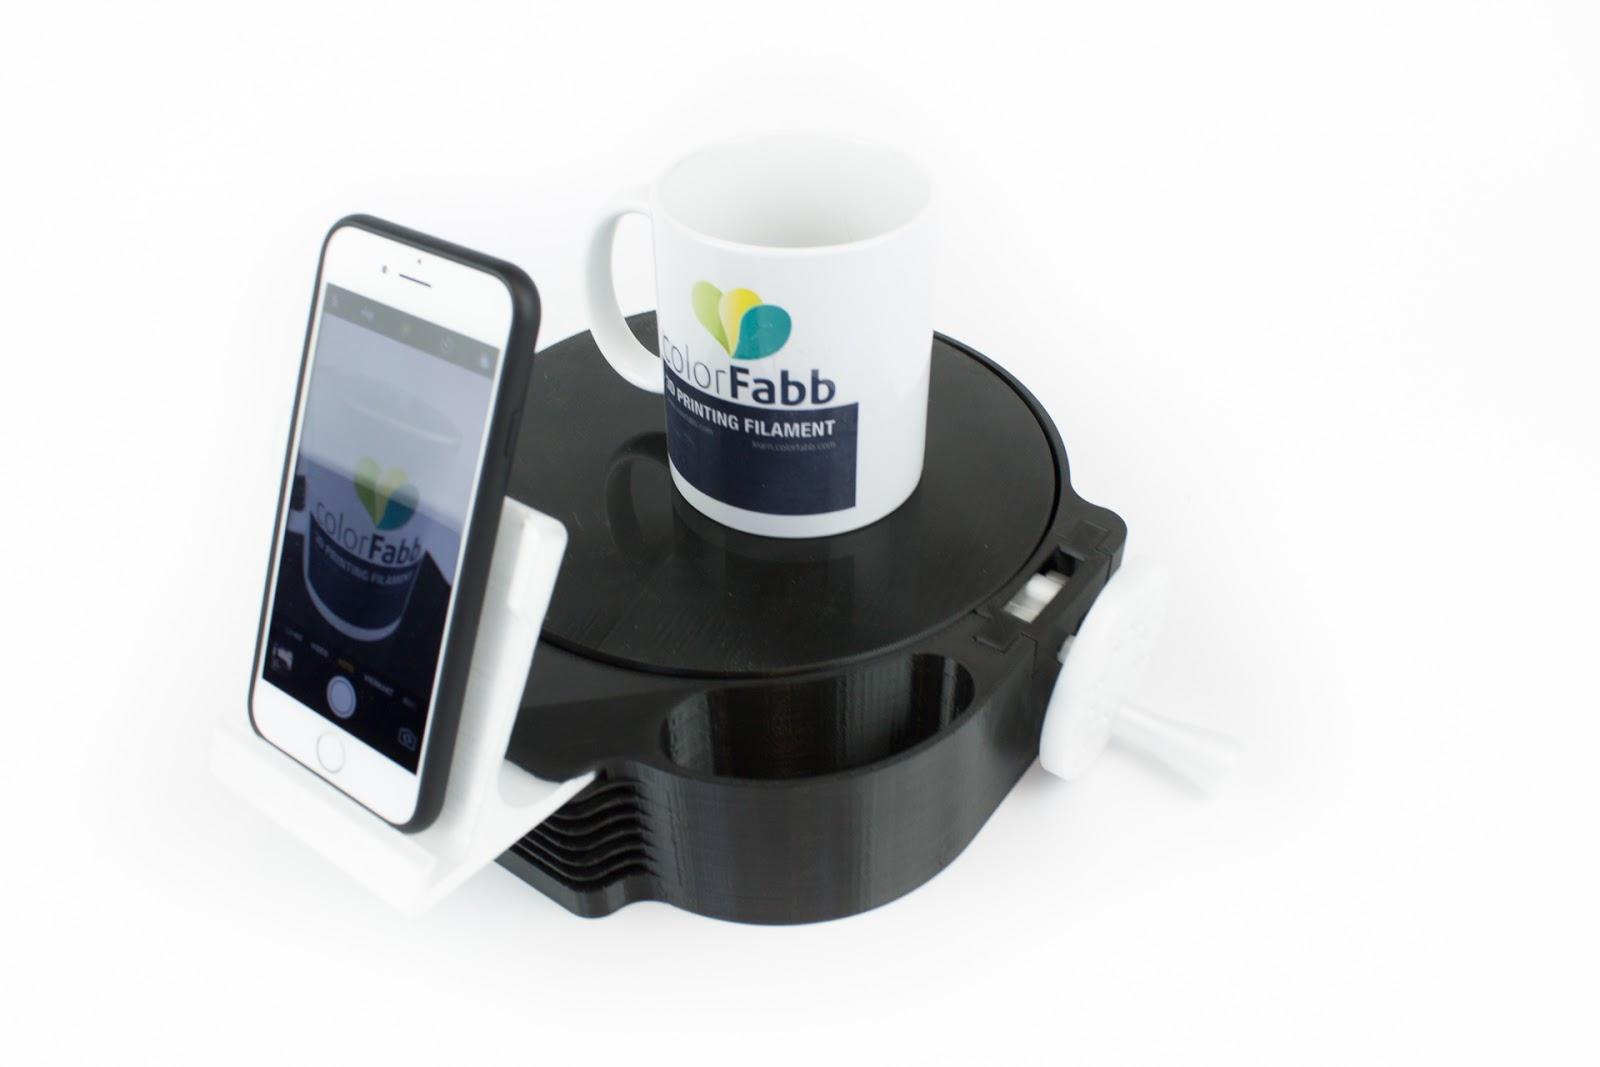 stampoin3d come autocostruirsi uno scanner 3d per smartphone stampato in 3d. Black Bedroom Furniture Sets. Home Design Ideas